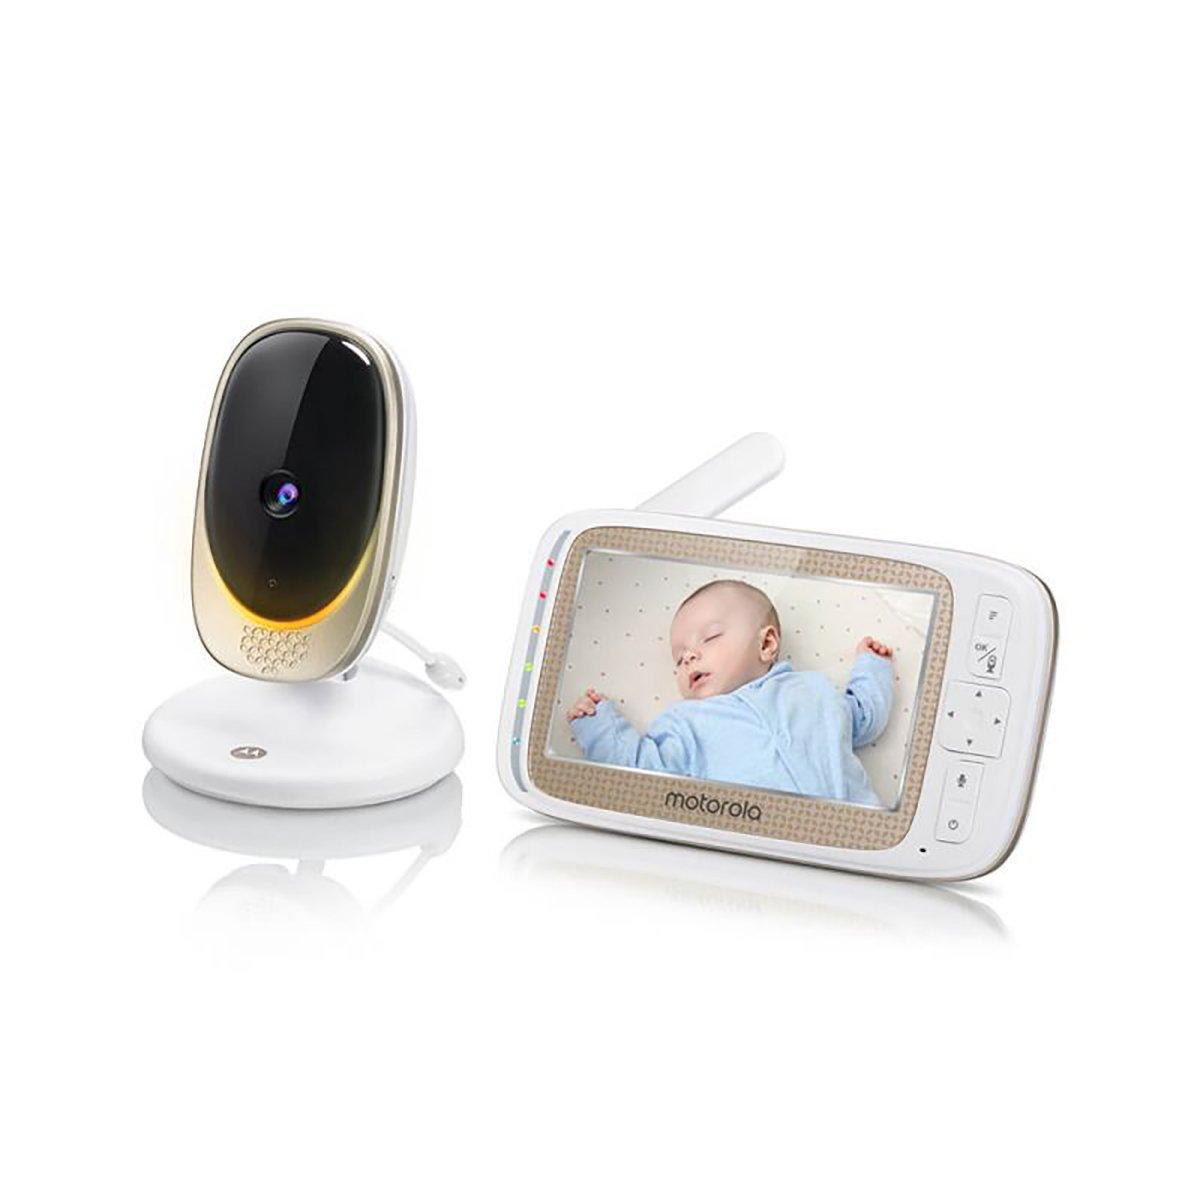 Video Monitor Digital + Wi-Fi Connect Motorola Comfort60 imagine